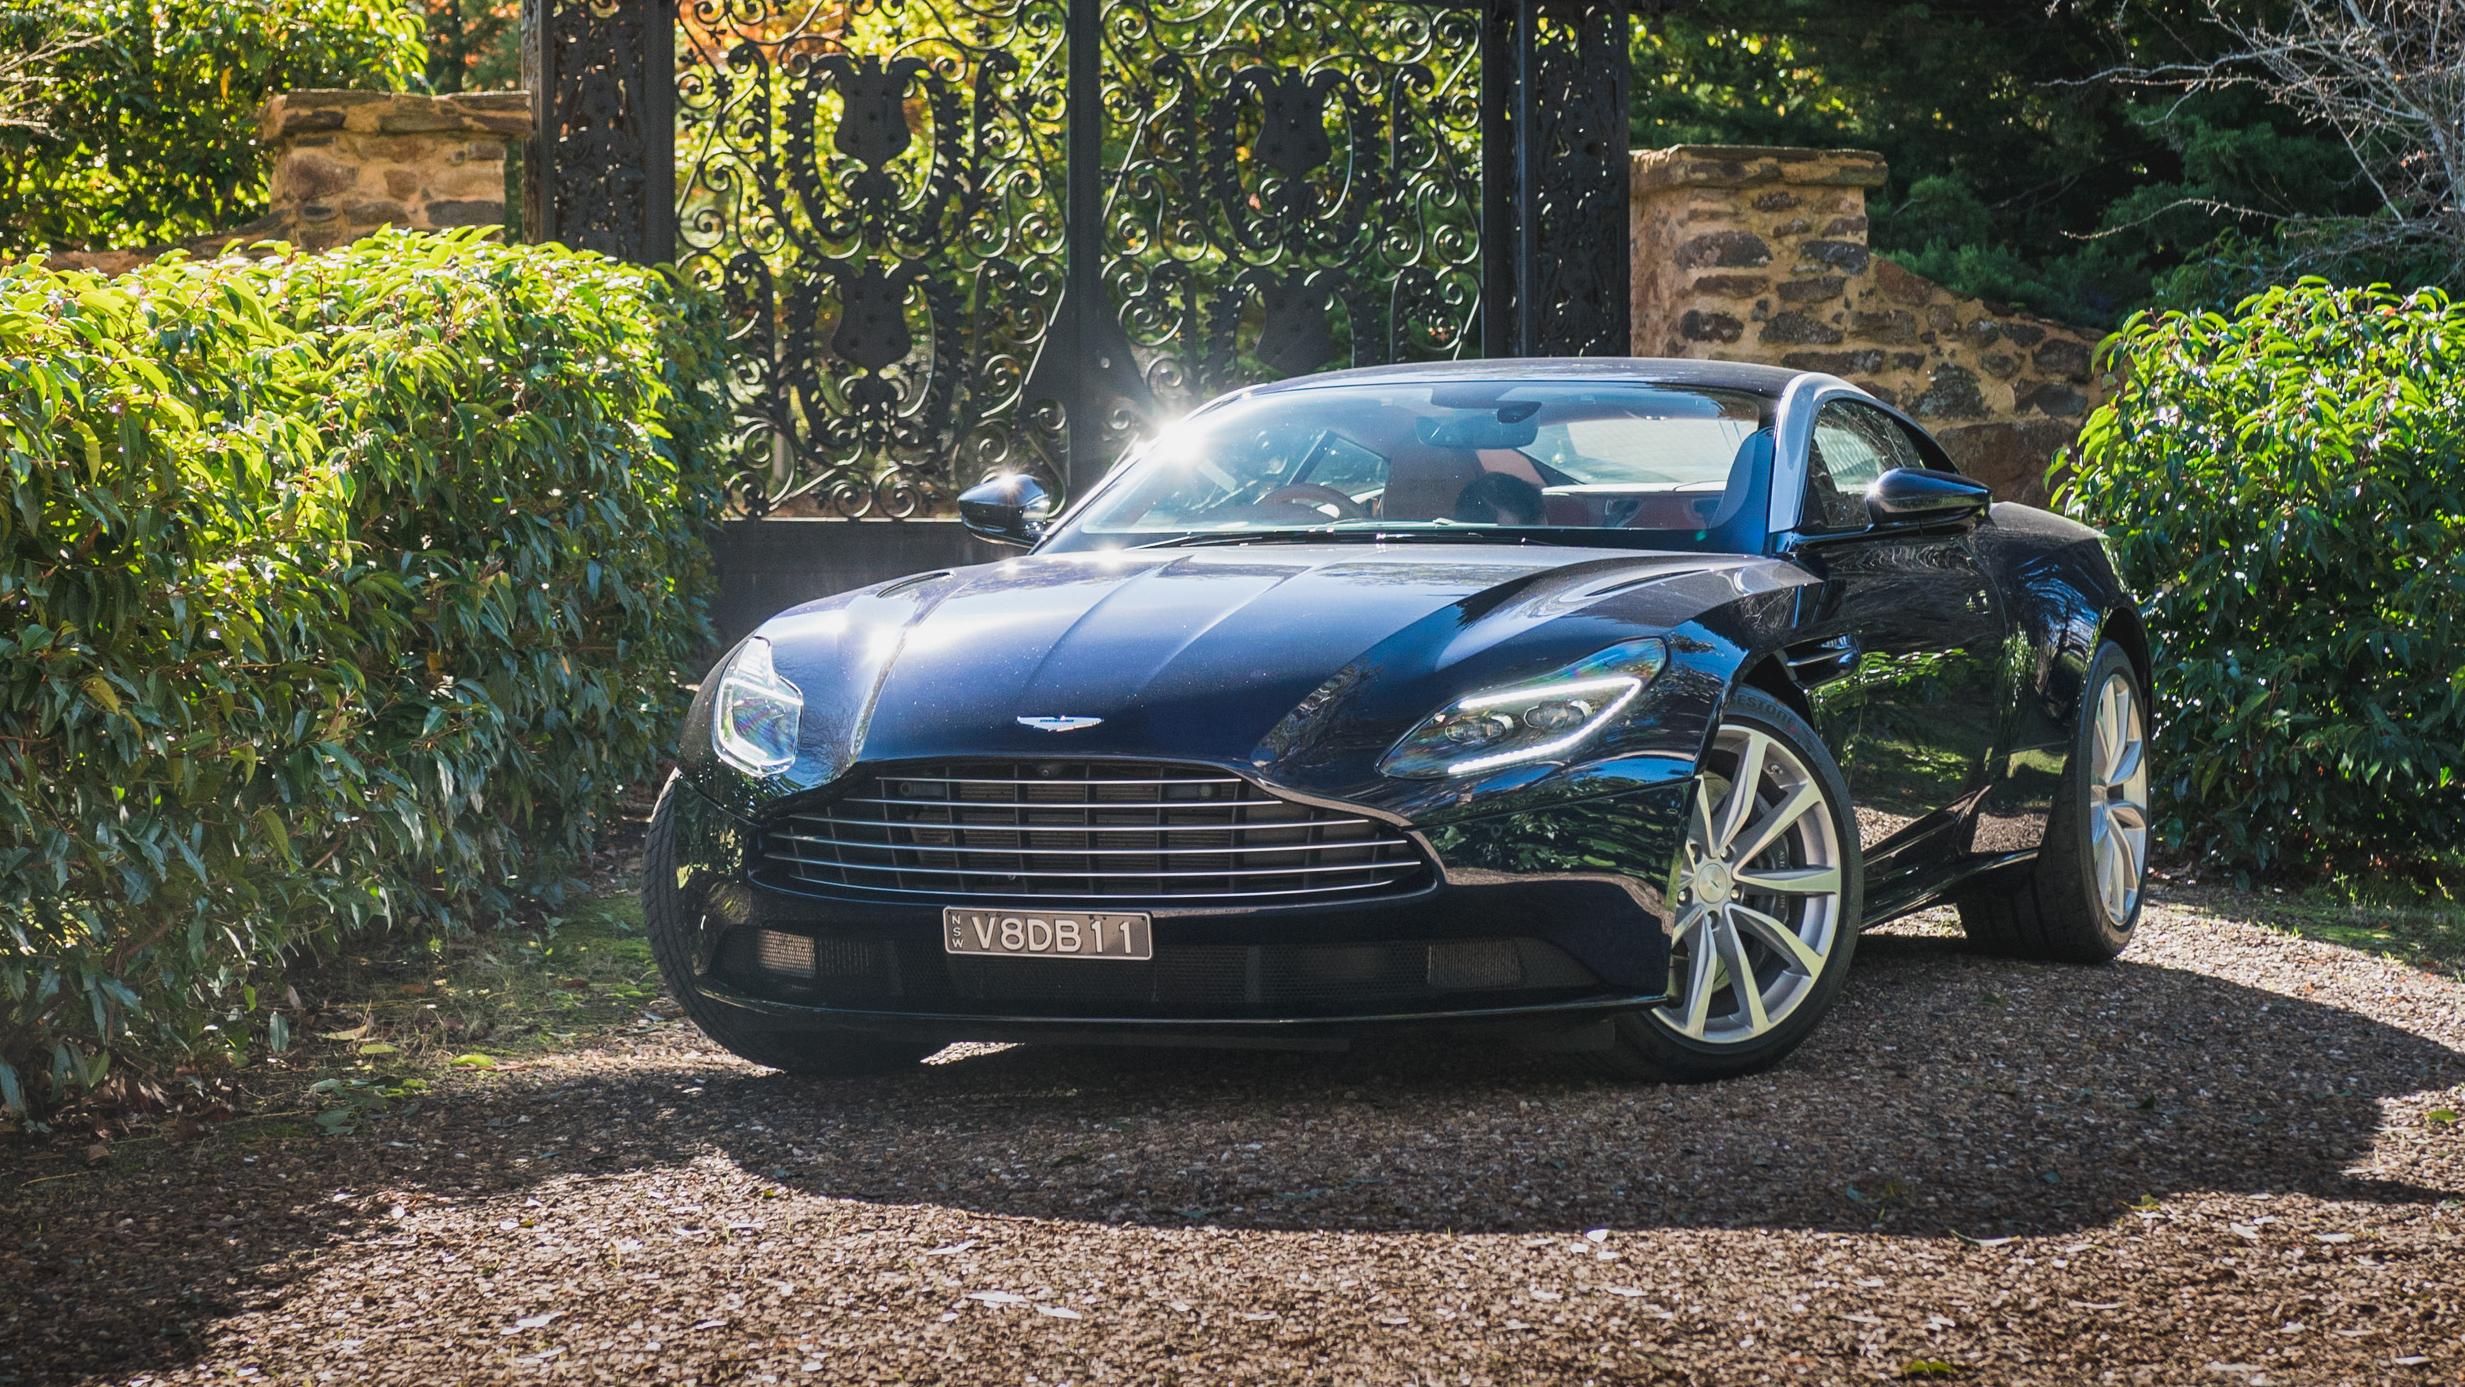 2019 Aston Martin Db11 V8 Review Caradvice